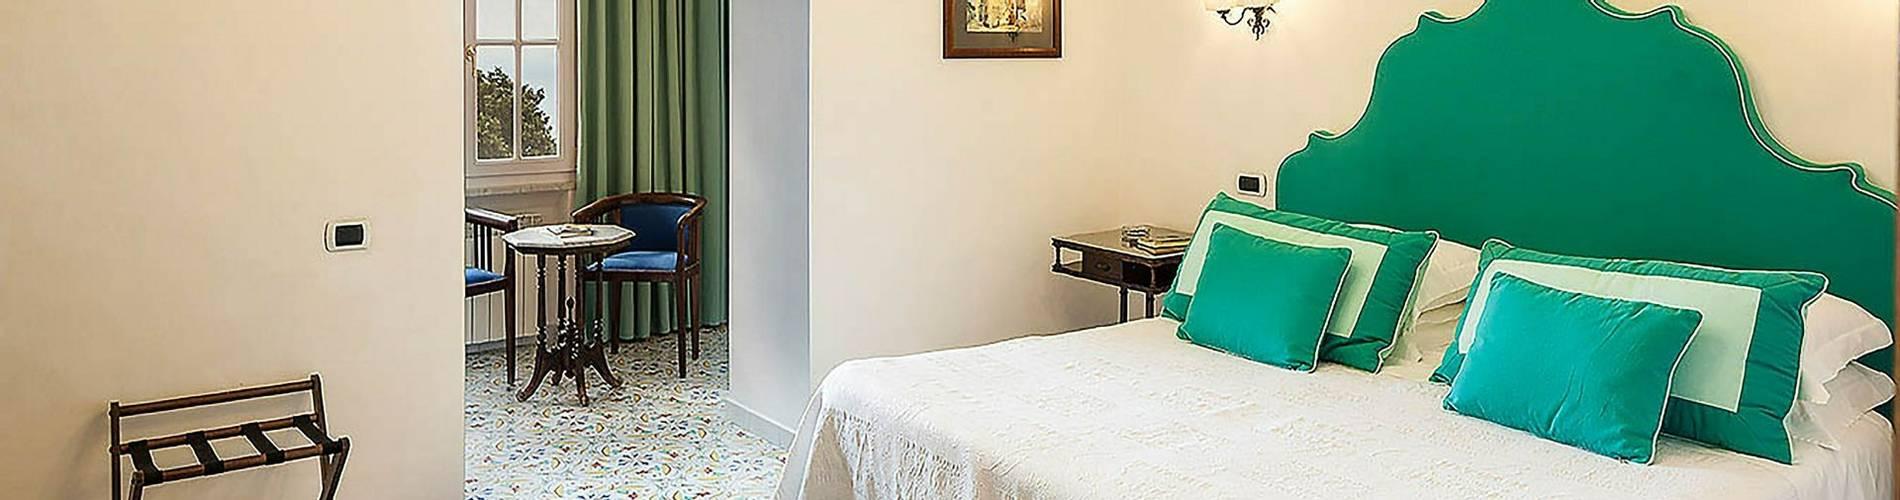 Villa Maria, Amalfi Coast, Italy, superior-104.jpg